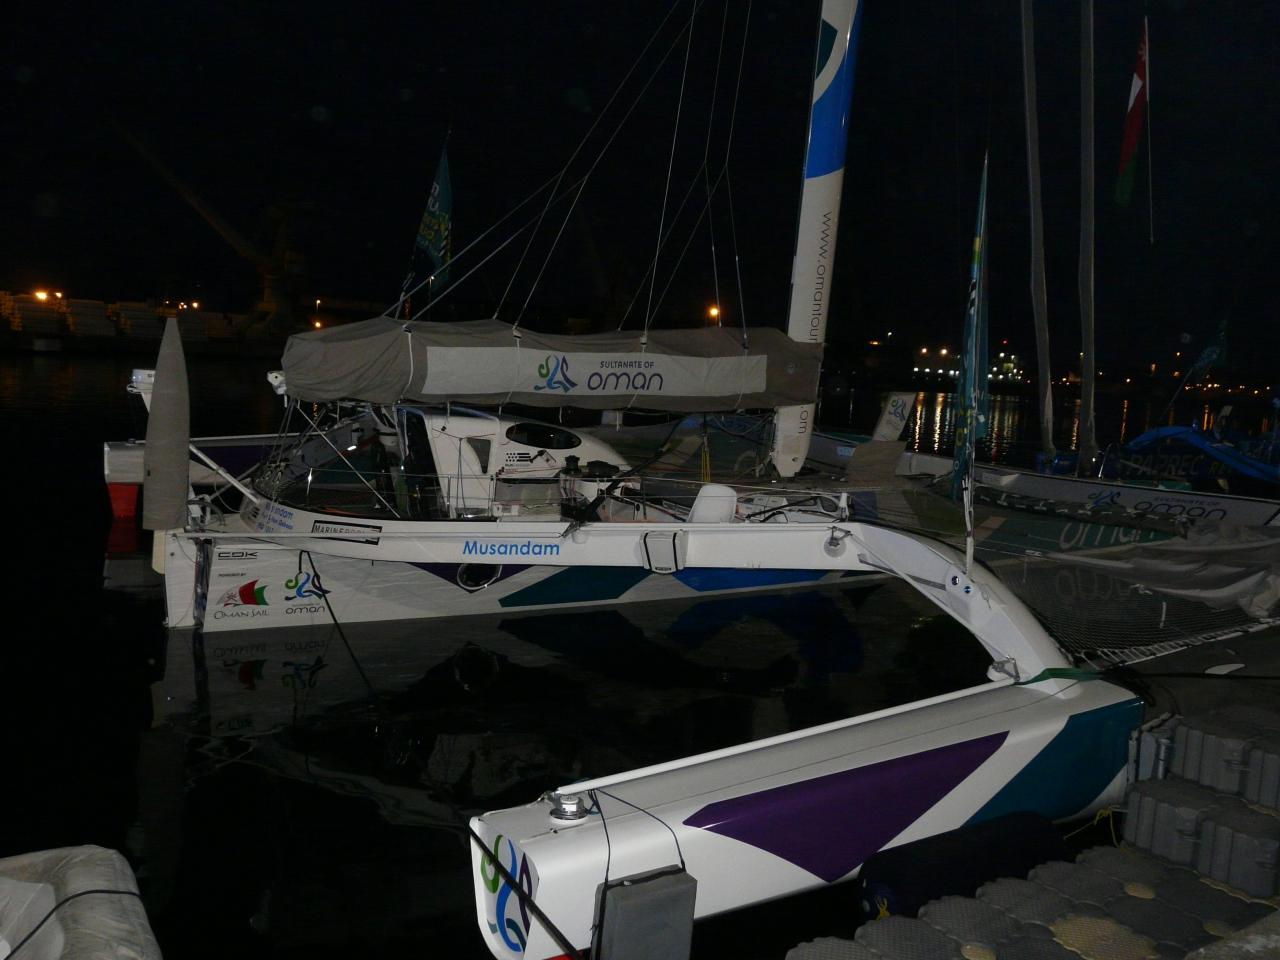 A la barre du MOD 70 Musandam-Oman Sail